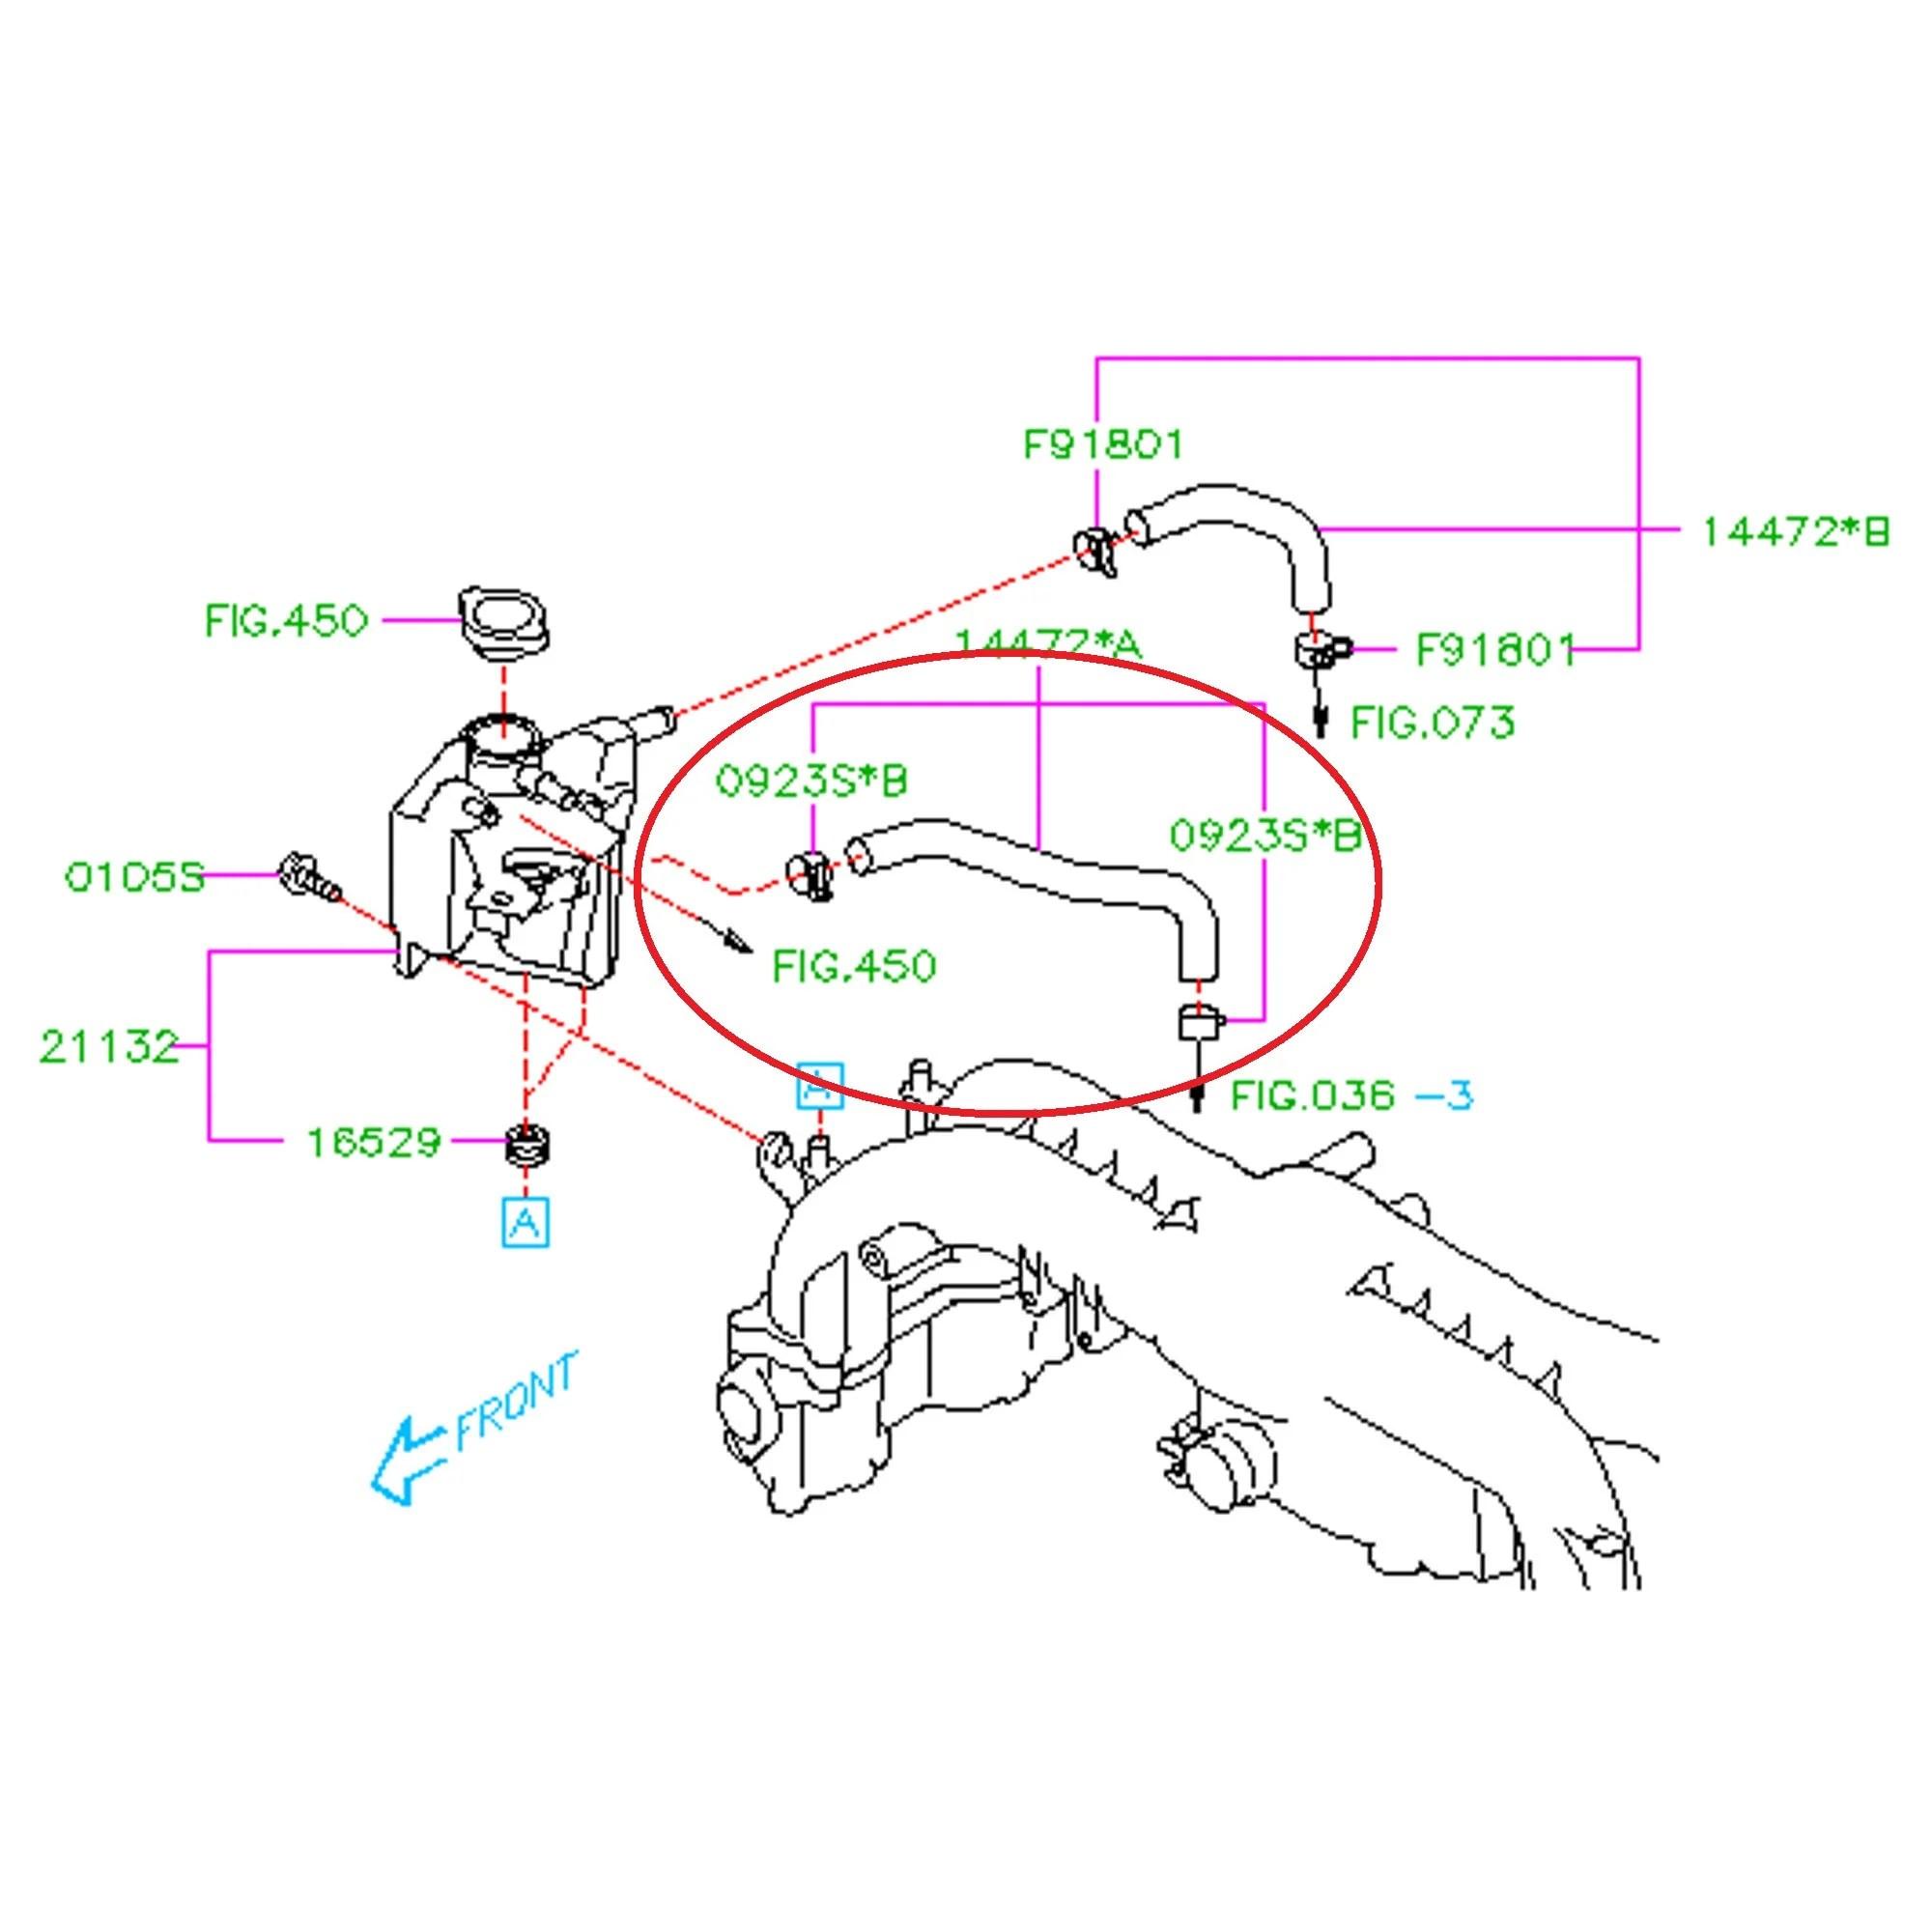 small resolution of vacuum line diagram on 2004 subaru impreza wrx sti parts diagram subaru wrx wiring diagram 2002